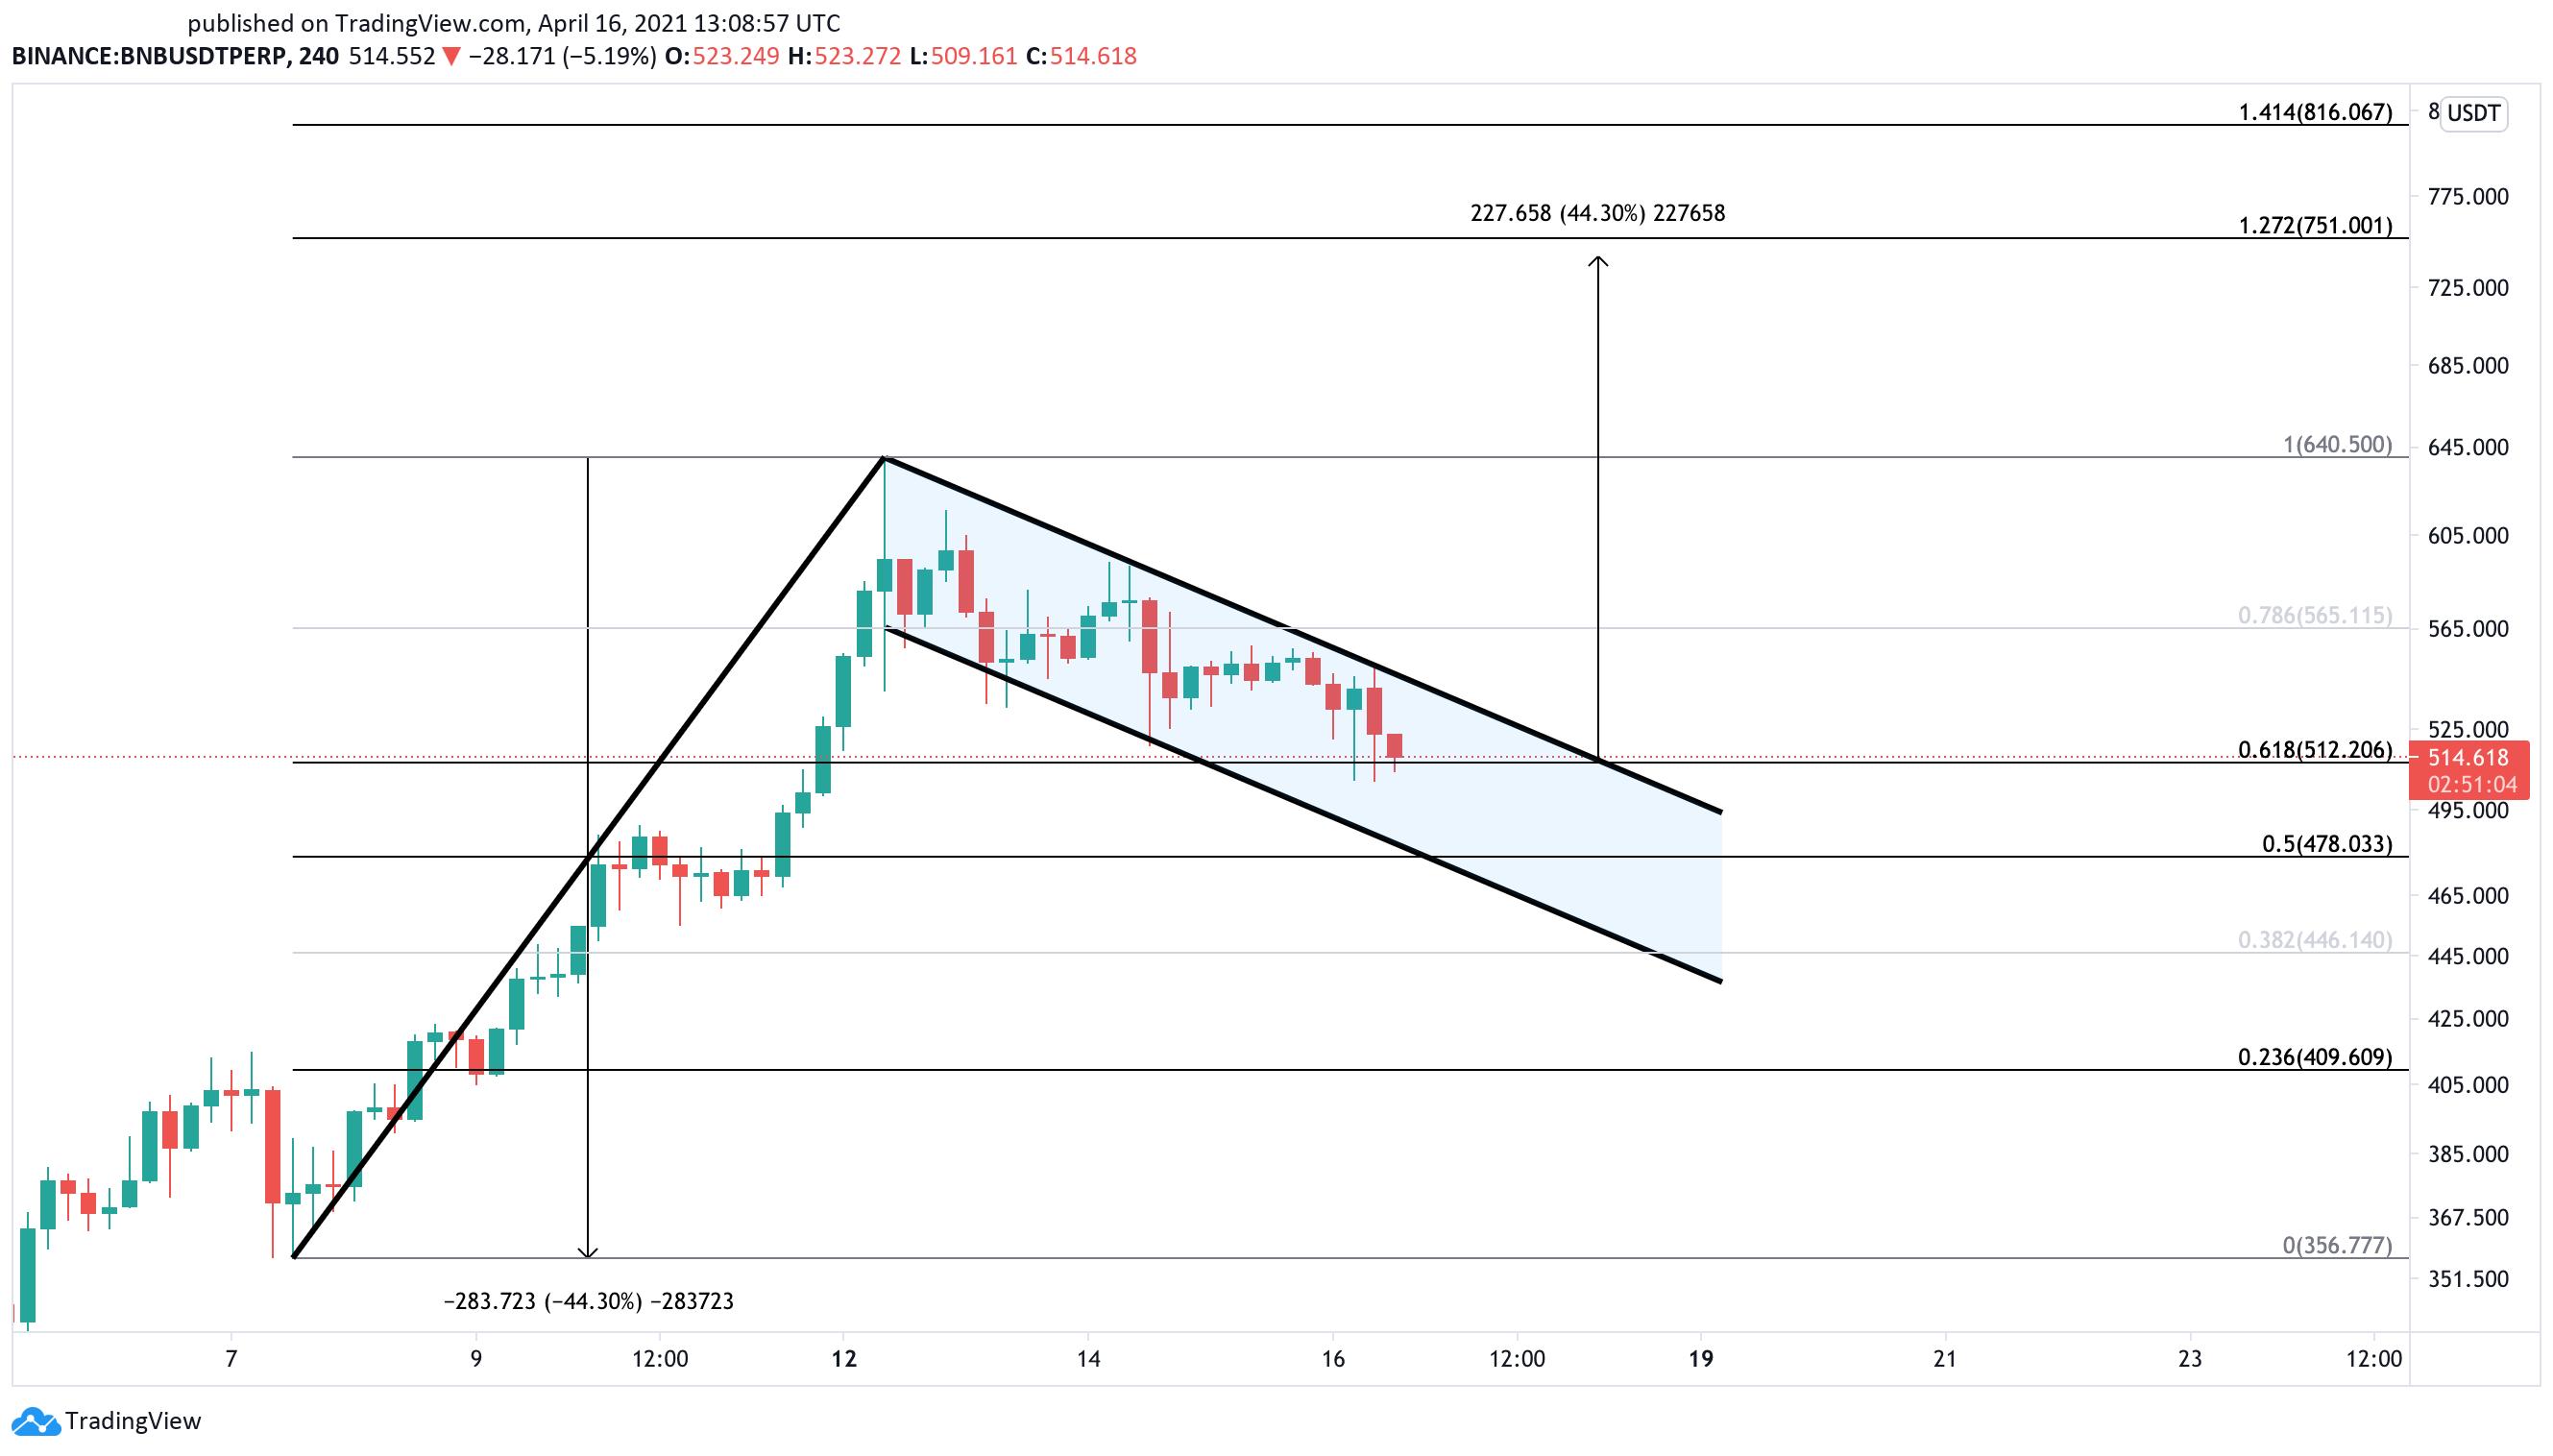 Binance US dollar price chart